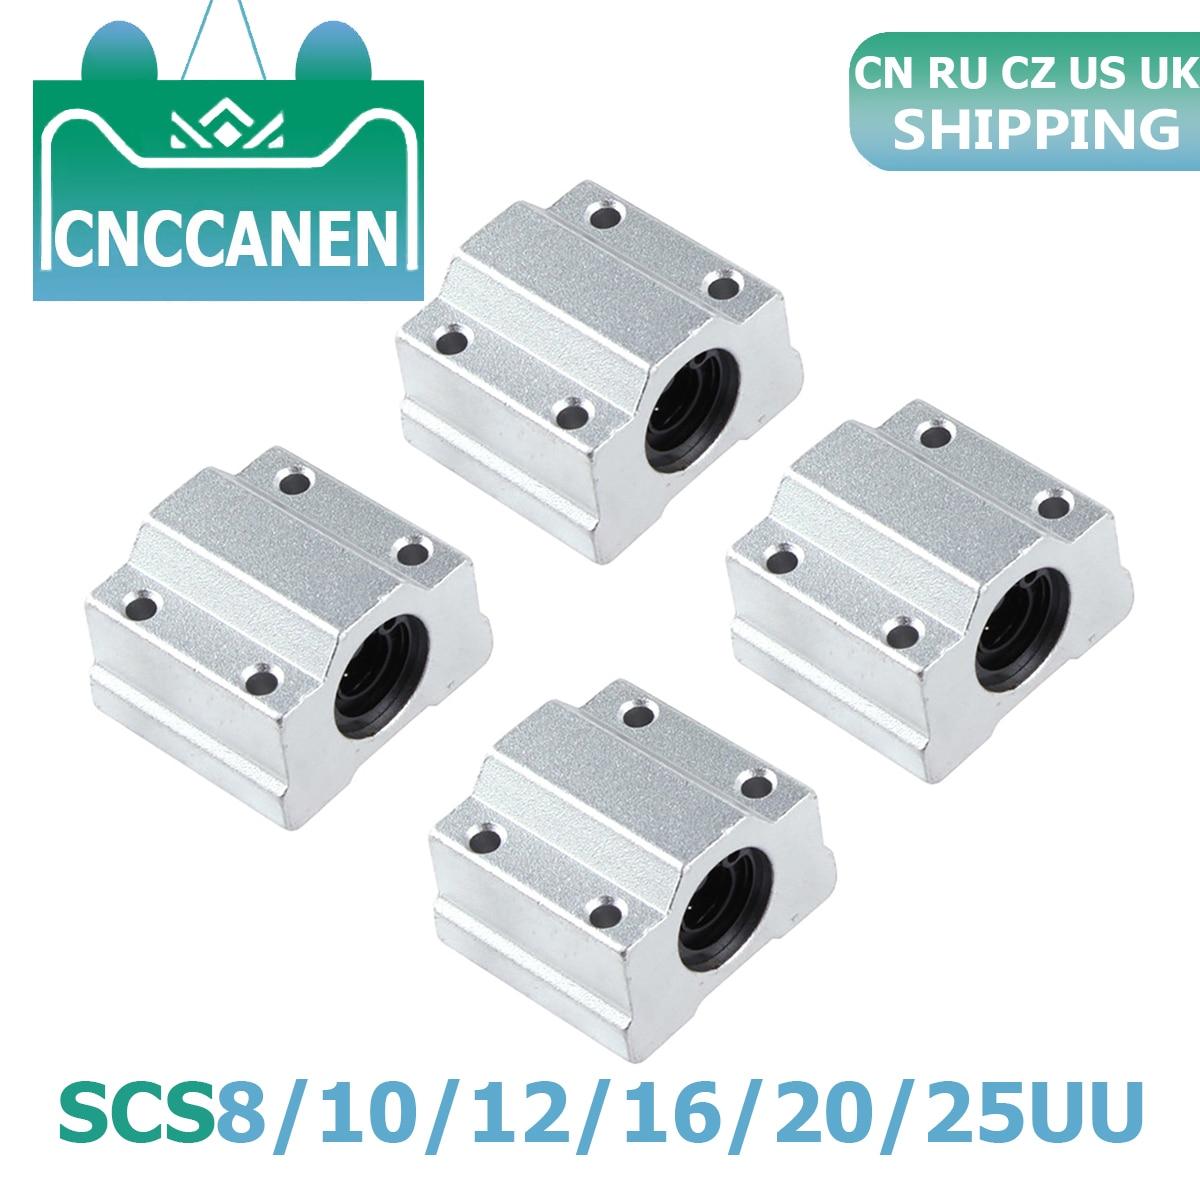 4PCS Linear Motion Ball Bearing Slide Block Bushing SC8UU SCS8UU SC10UU SCS12UU 16UU 20UU 25UU Linear Shaft CNC 3D Printer Parts